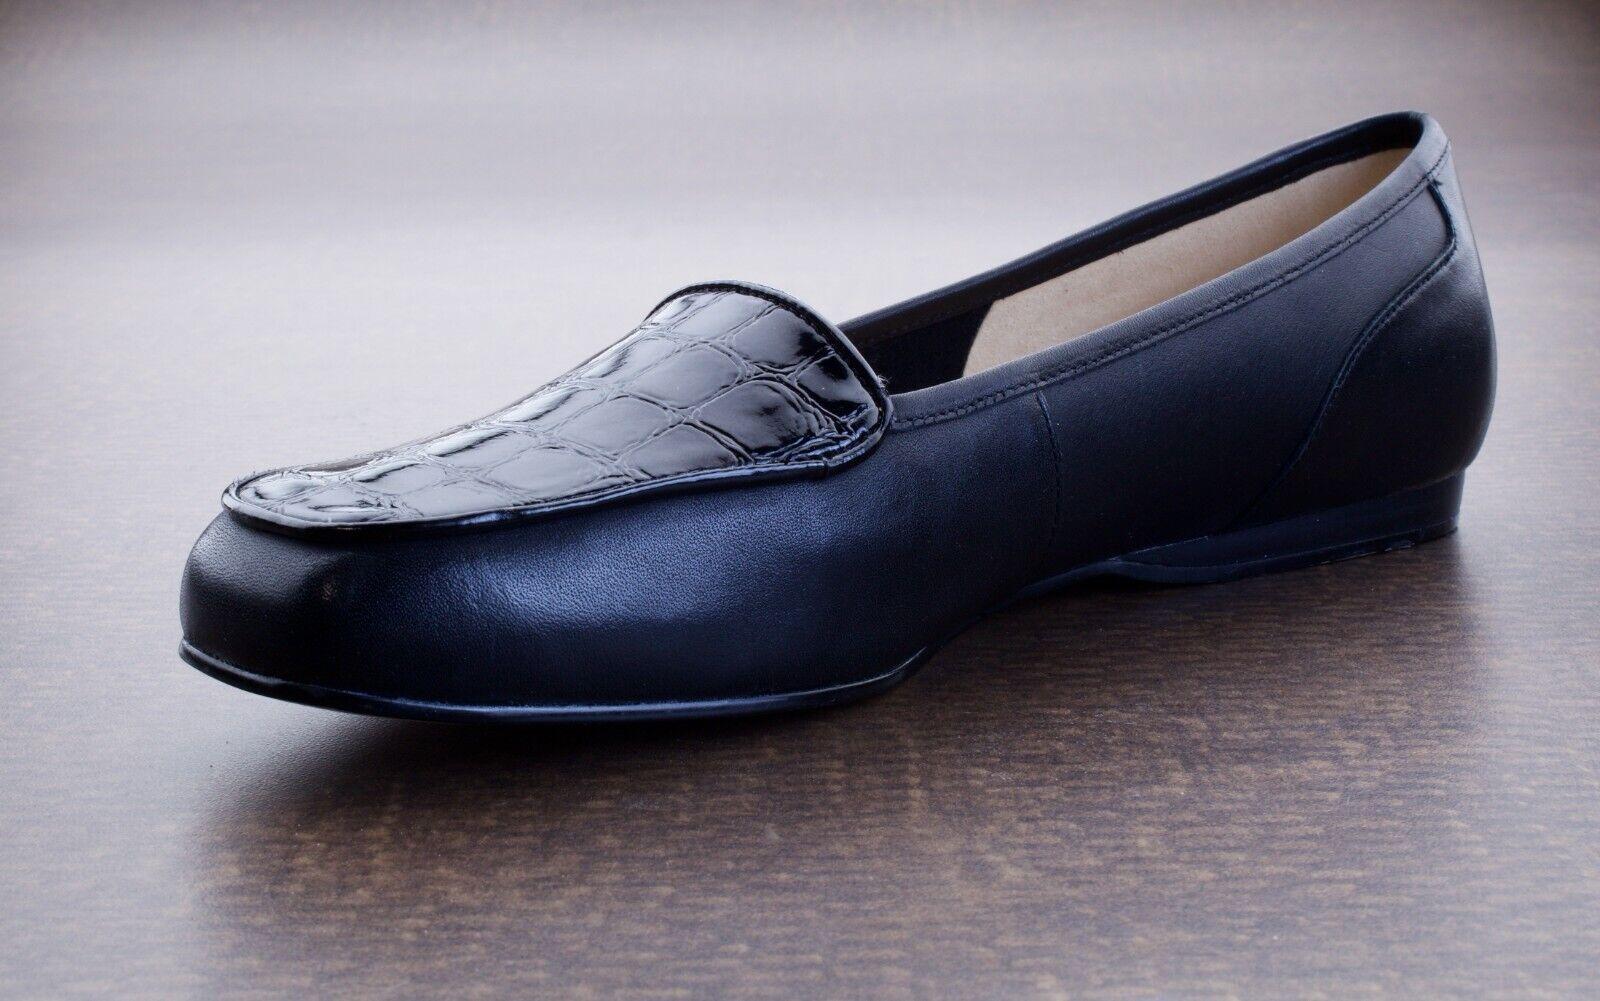 Bandolino Leather Flats Women's Shoes 8.5 W NEW